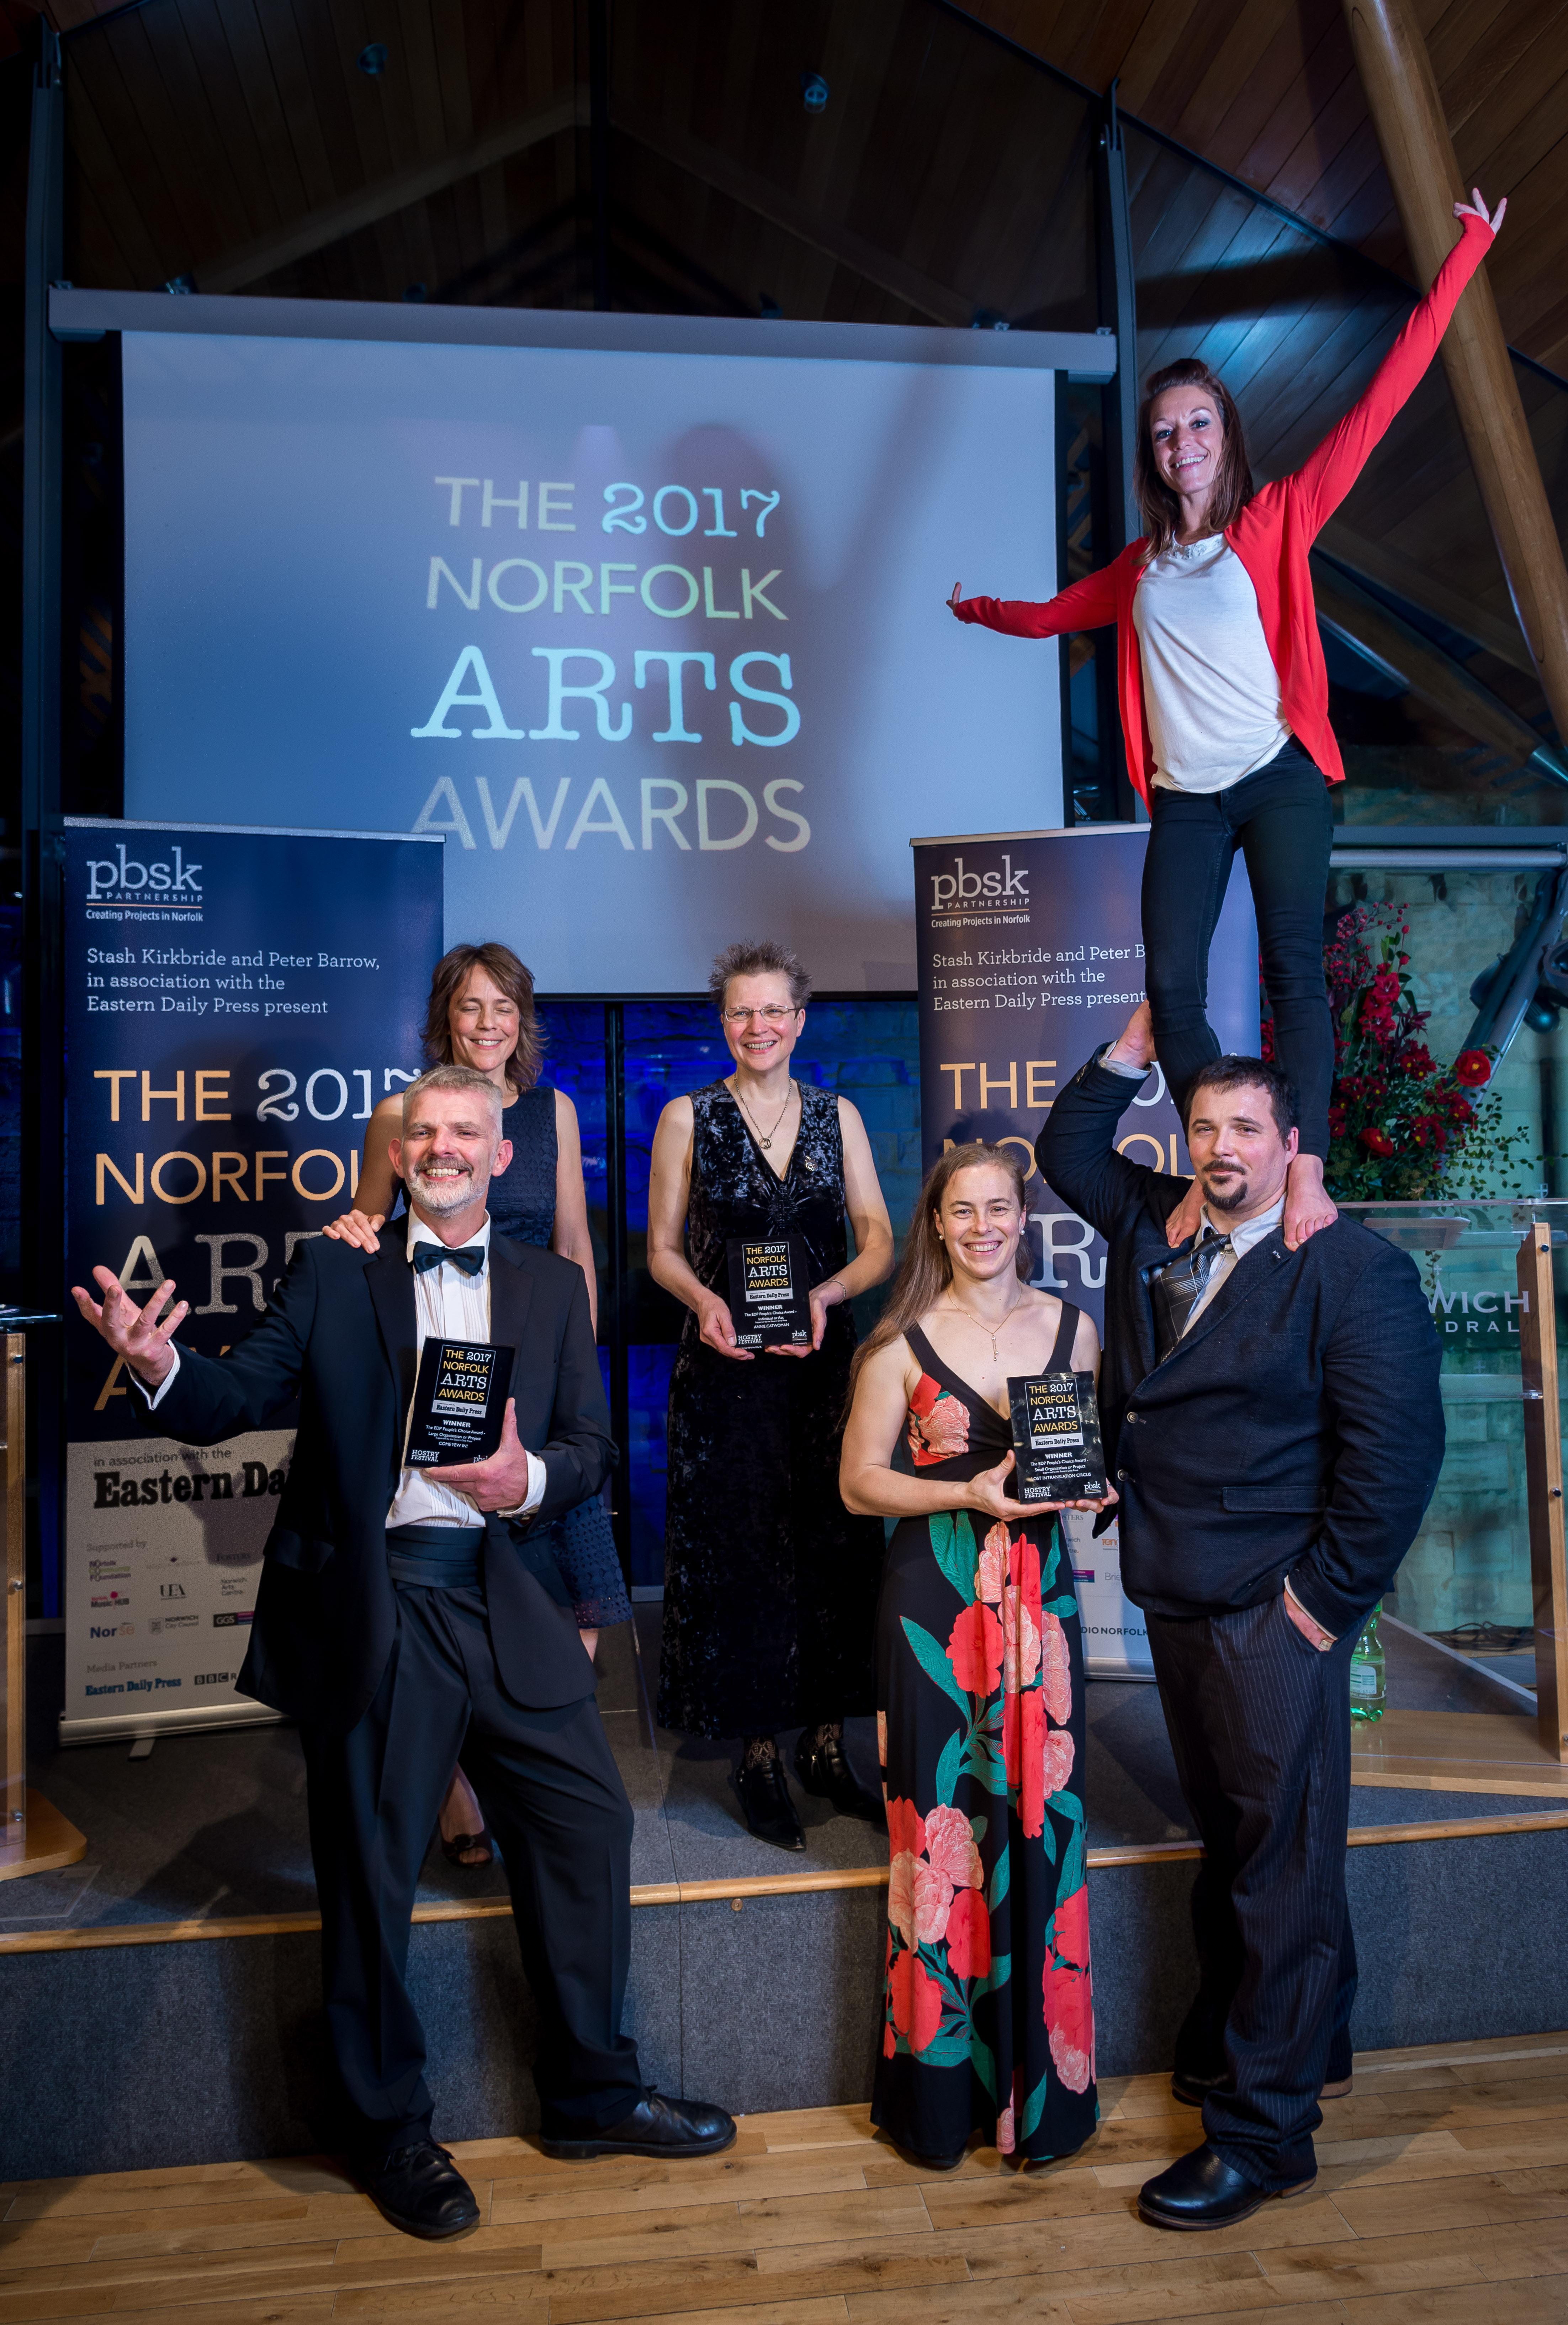 Norfolk Arts Awards 2017 at The Hostry at Norwich Cathedral. Photo credit ©Simon Finlay Photography.